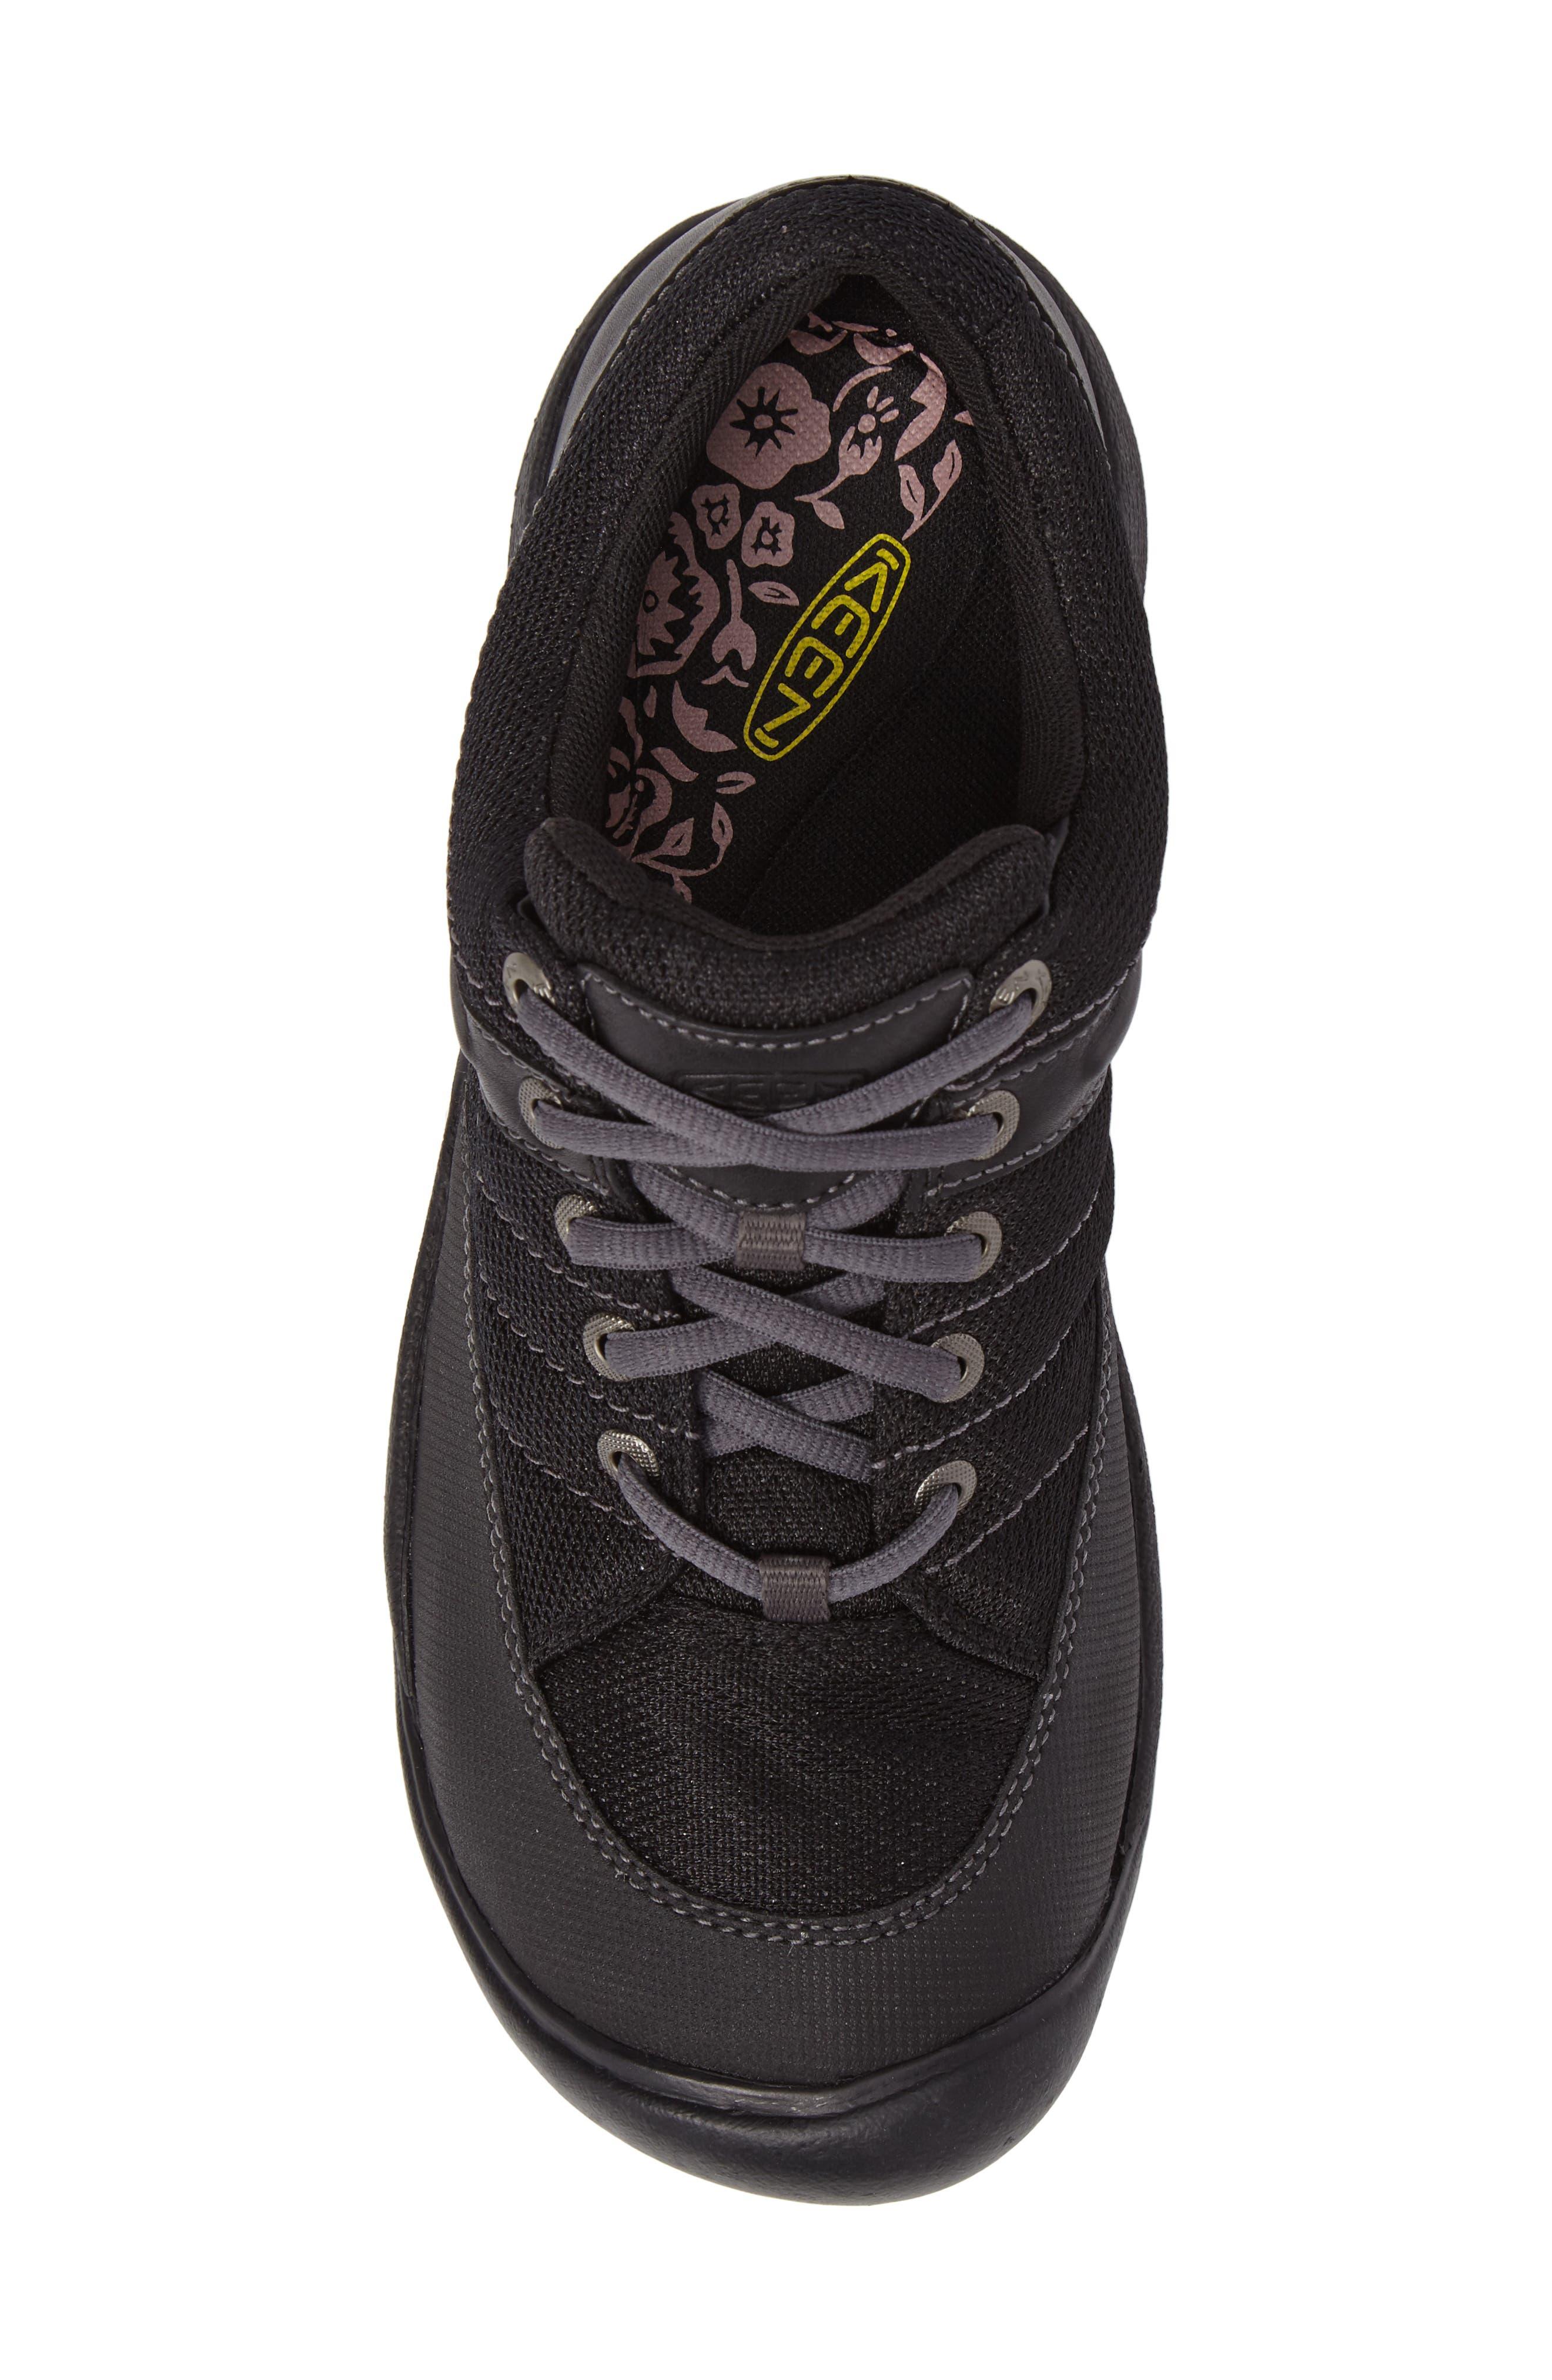 Presidio Waterproof Sport Sneaker,                             Alternate thumbnail 5, color,                             BLACK LEATHER